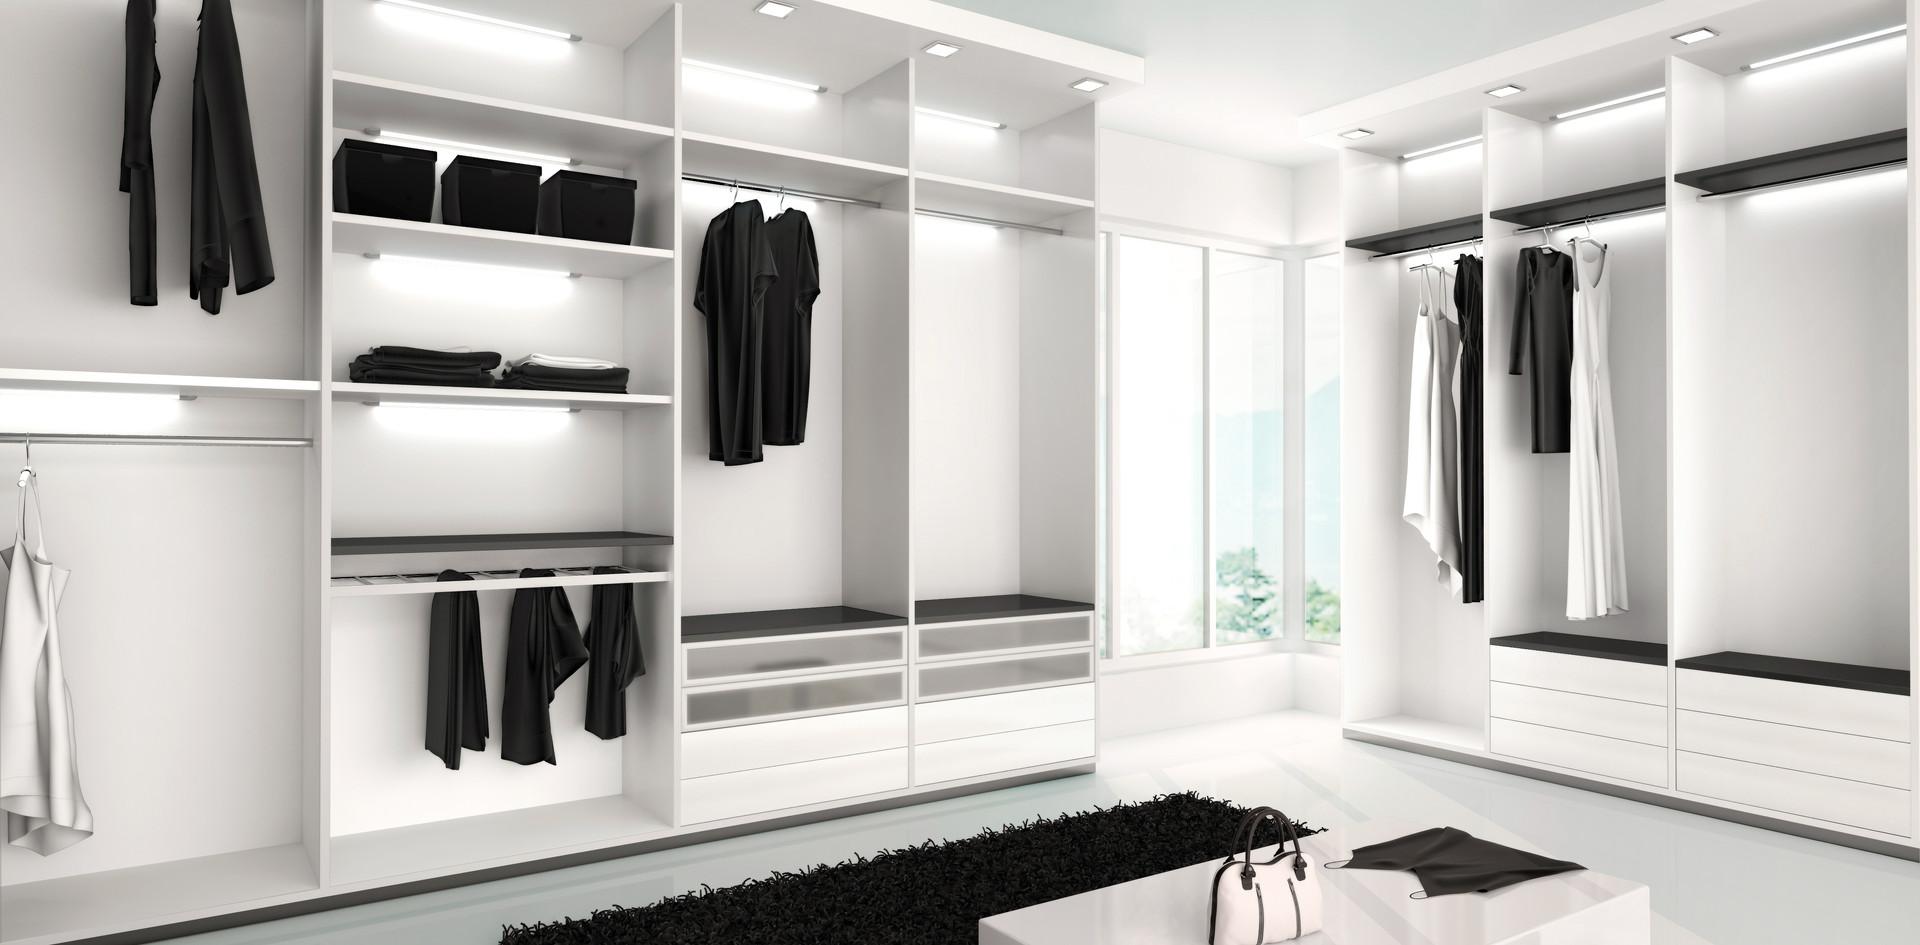 motte bedroom 8.jpeg